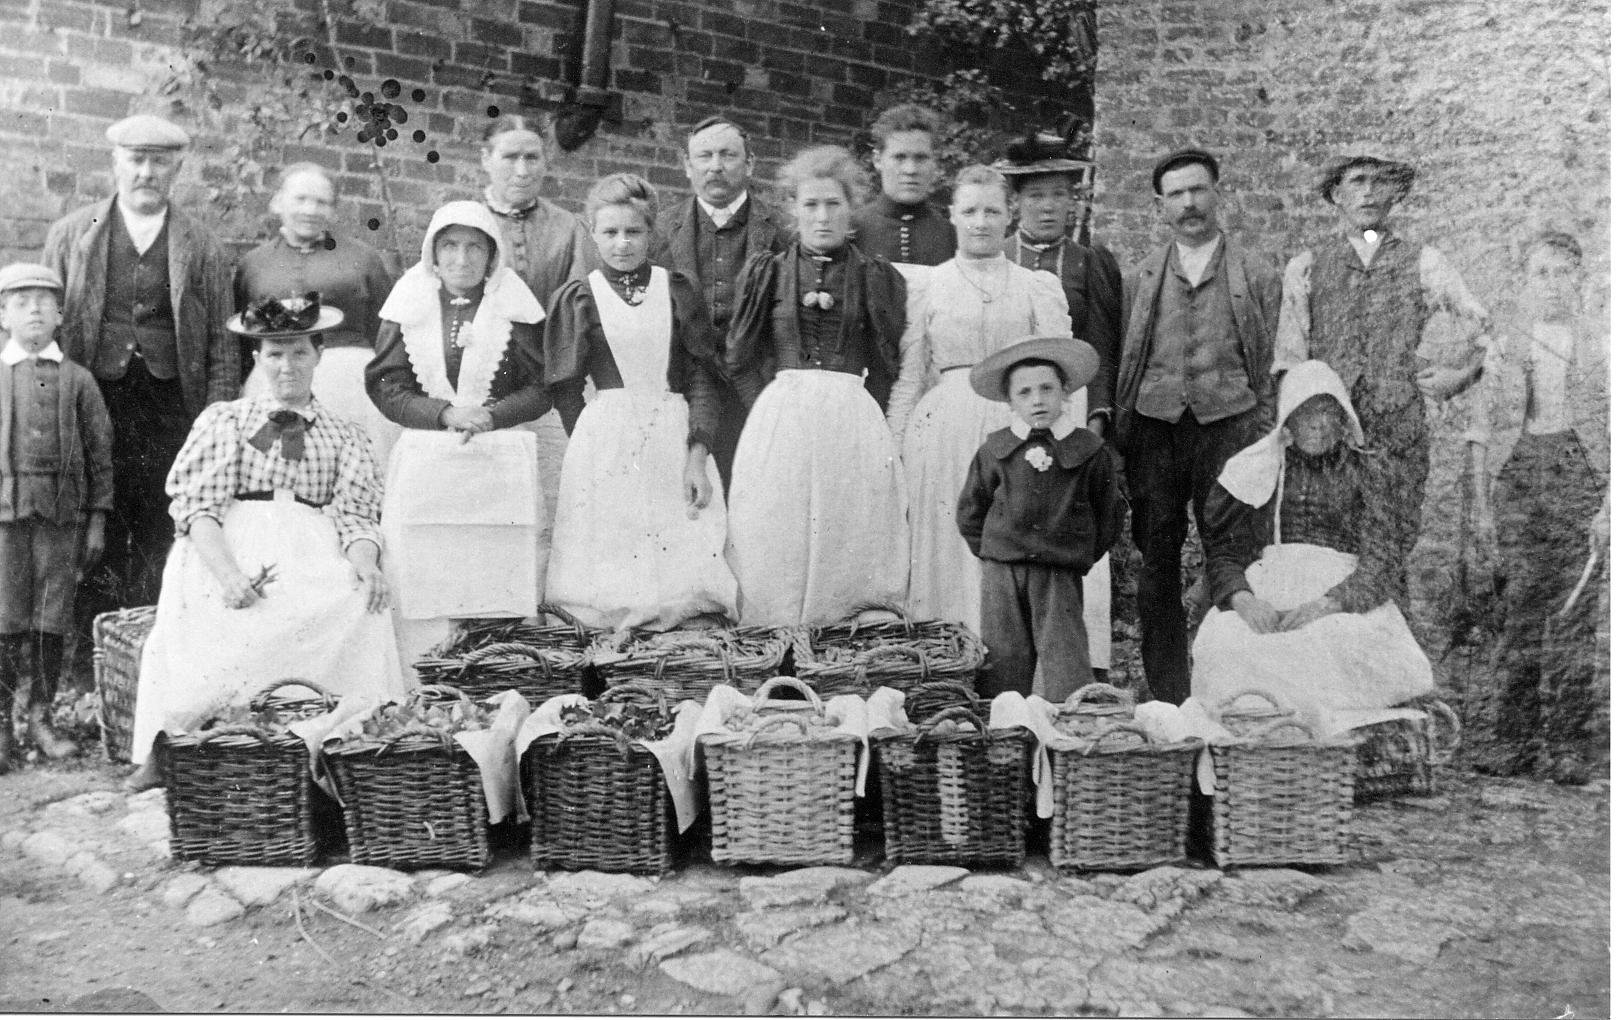 Market gardening produce - 1880